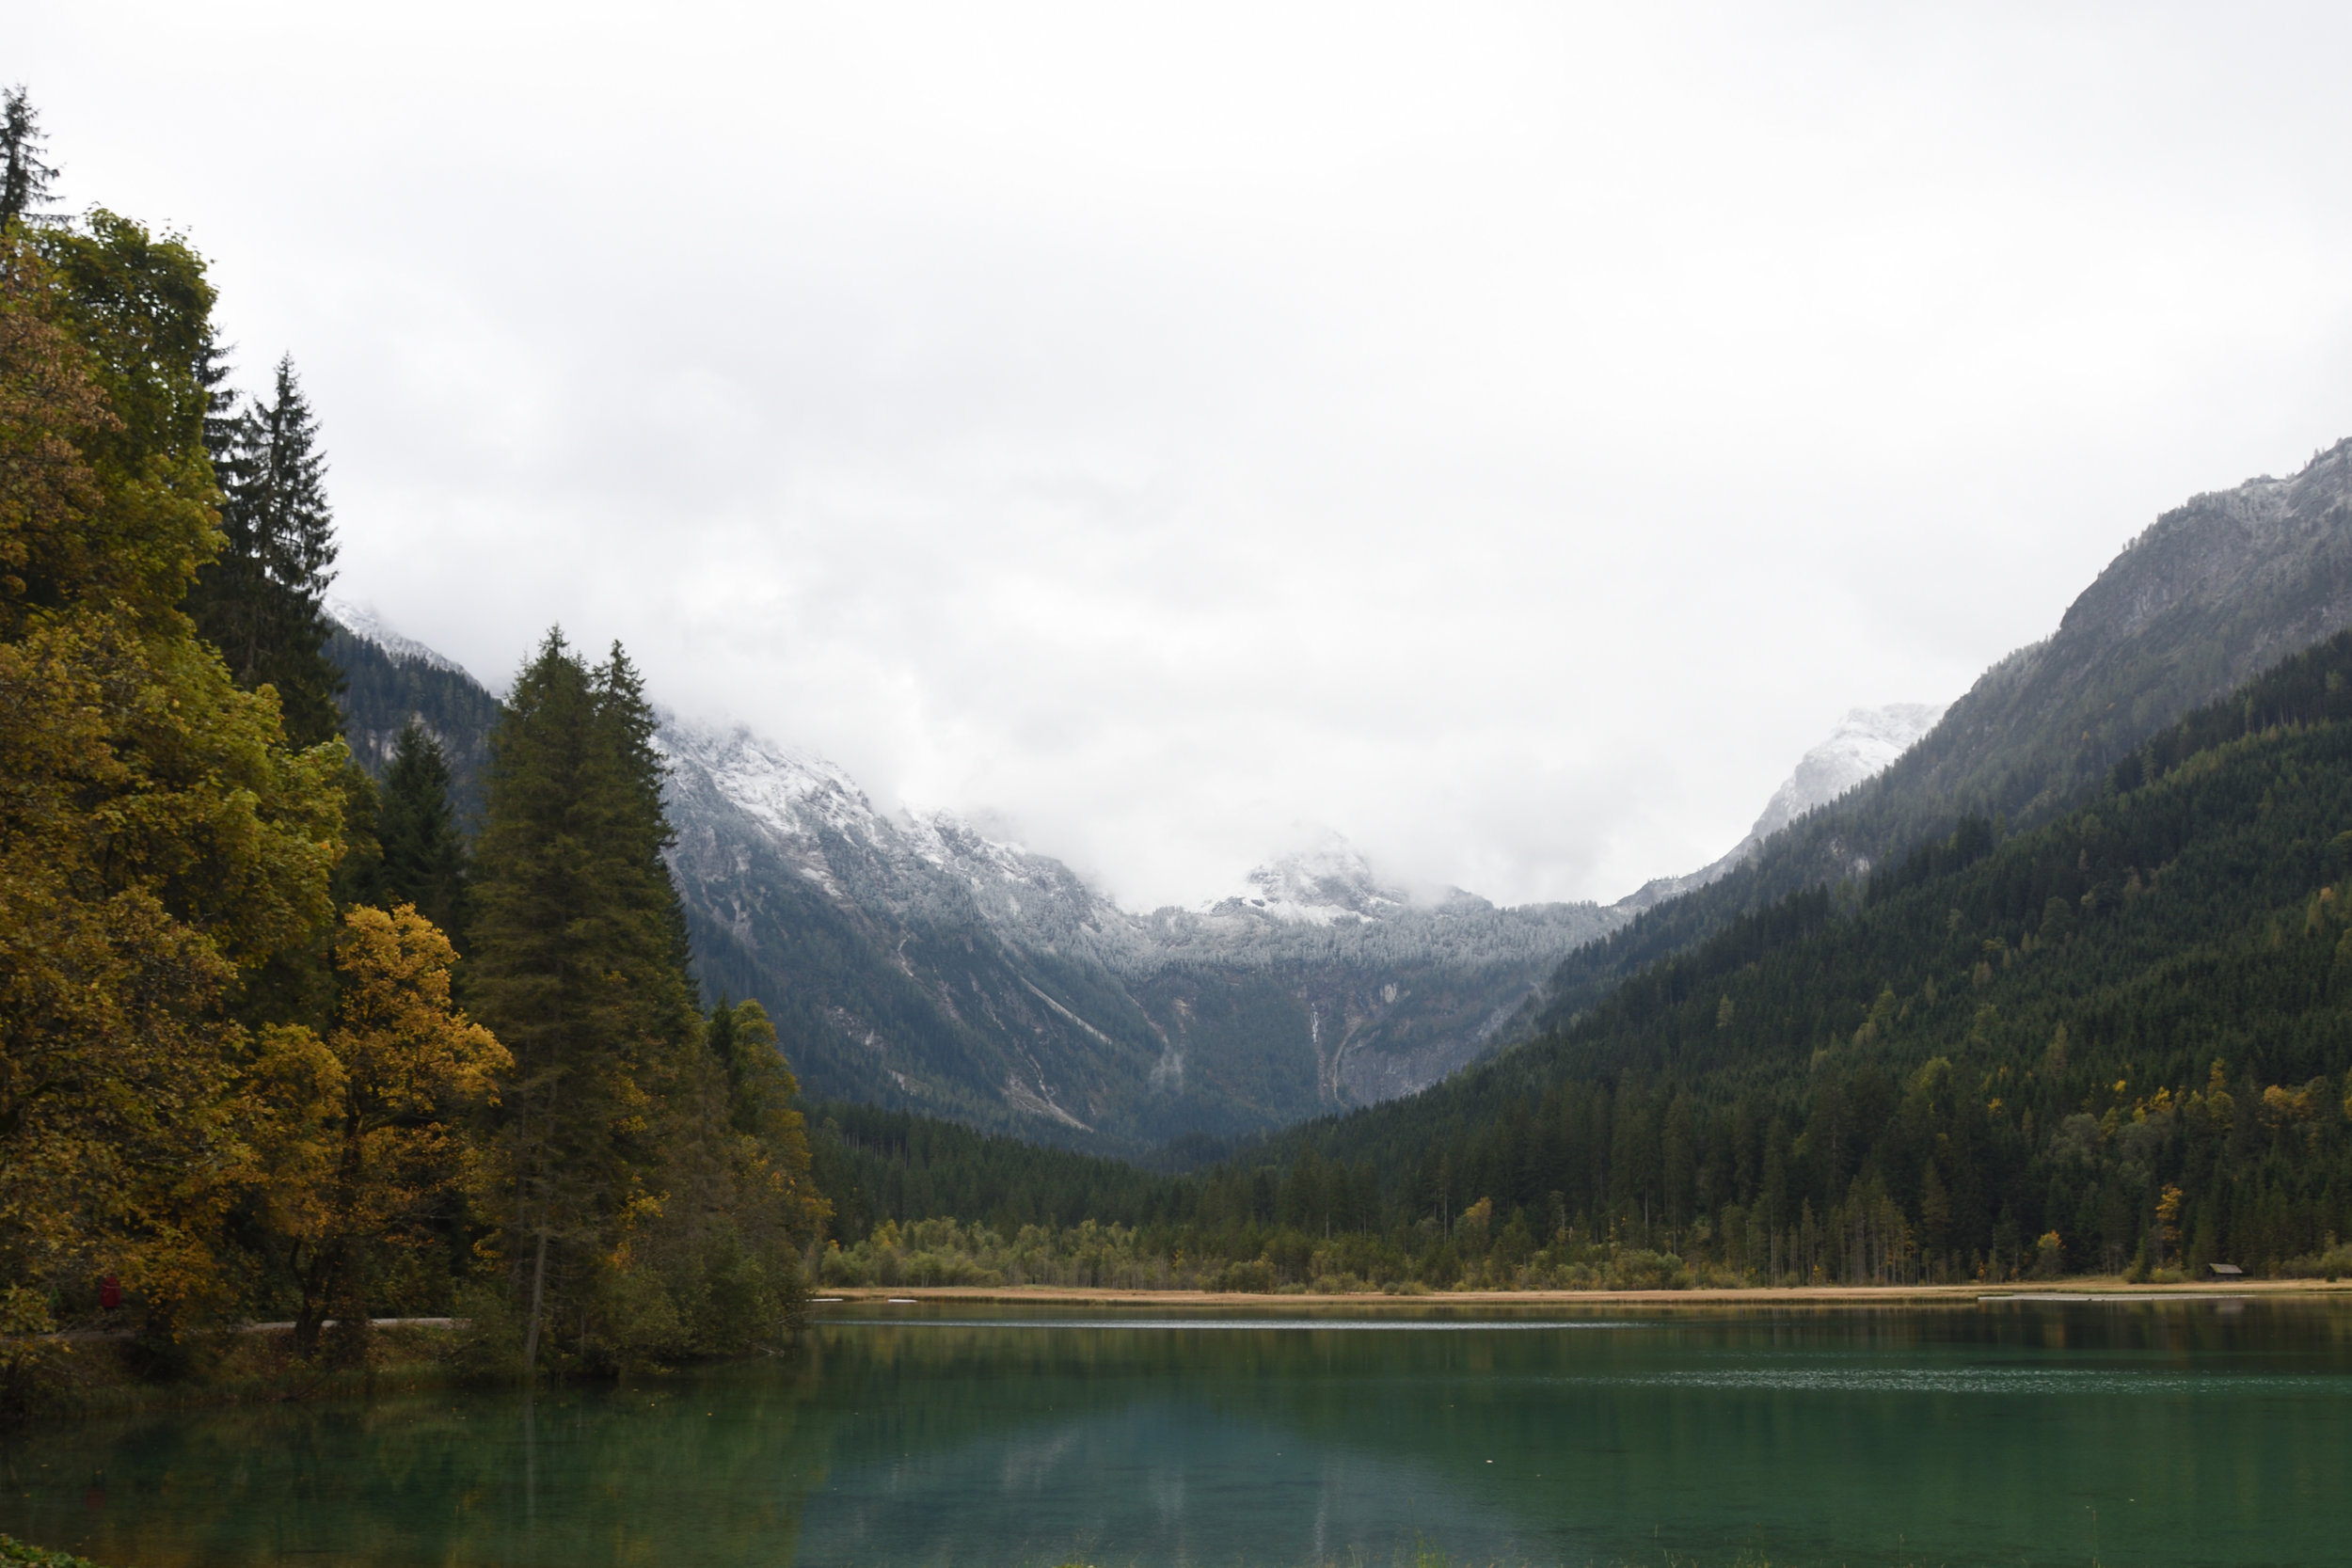 Jägersee, Salzburgerland, Austria 2016